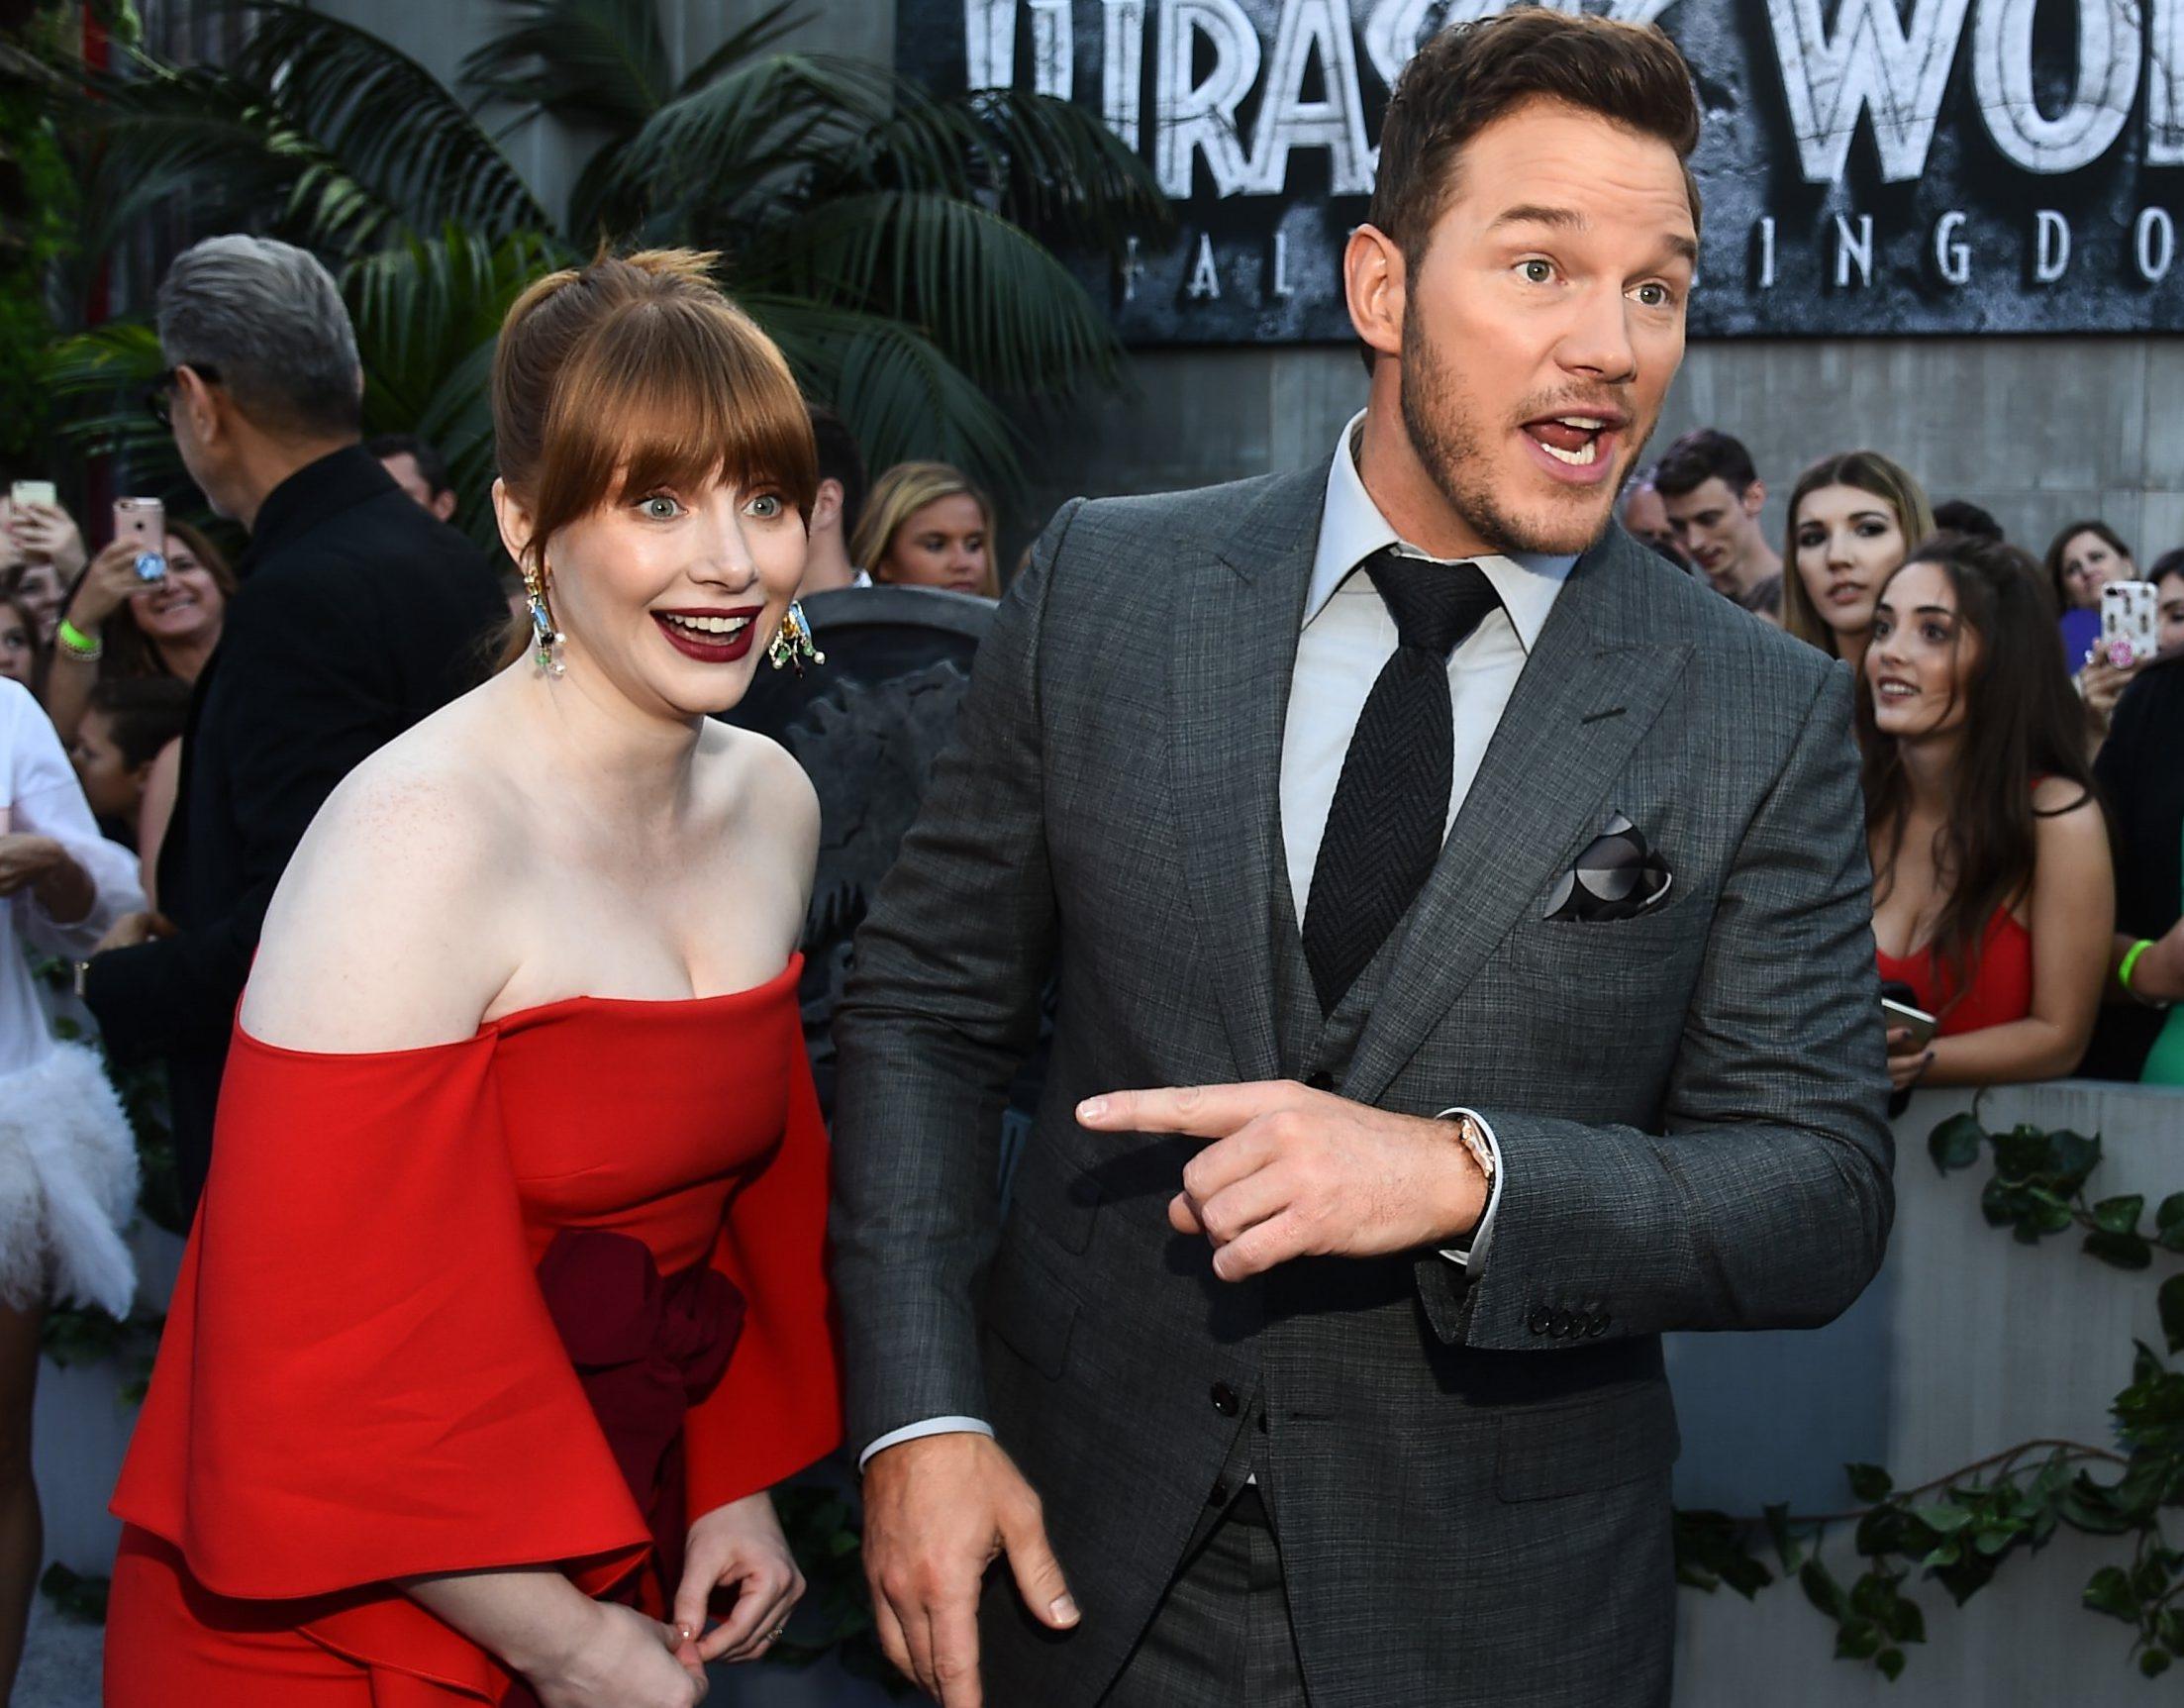 Chris Pratt and Bryce Dallas Howard celebrate as Jurassic World: Fallen Kingdom sells 4 million tickets in Korea